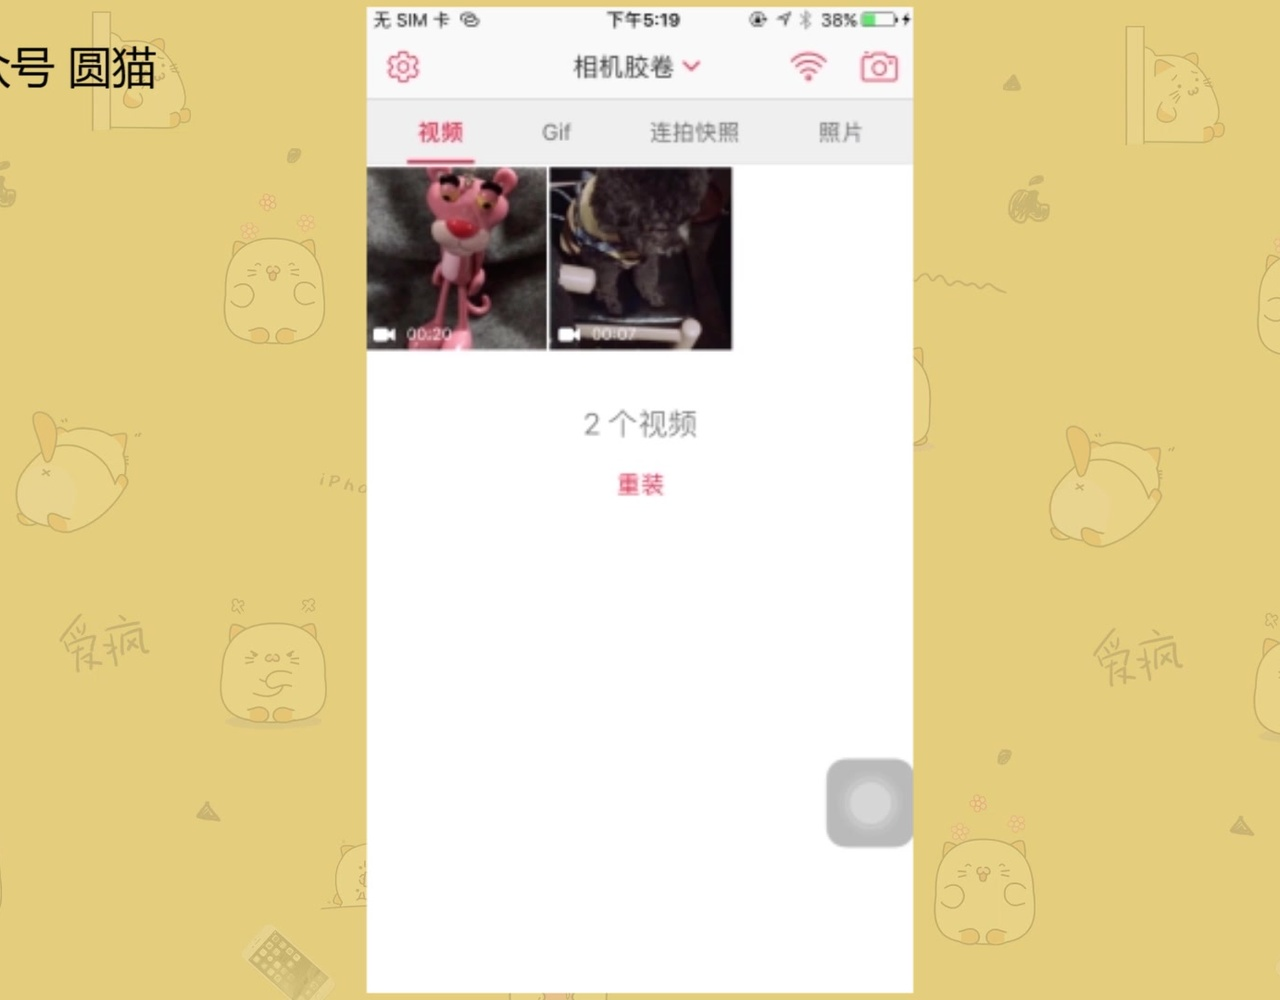 iPhone自制动态壁纸,任何视频图片都可以!好看有好玩!